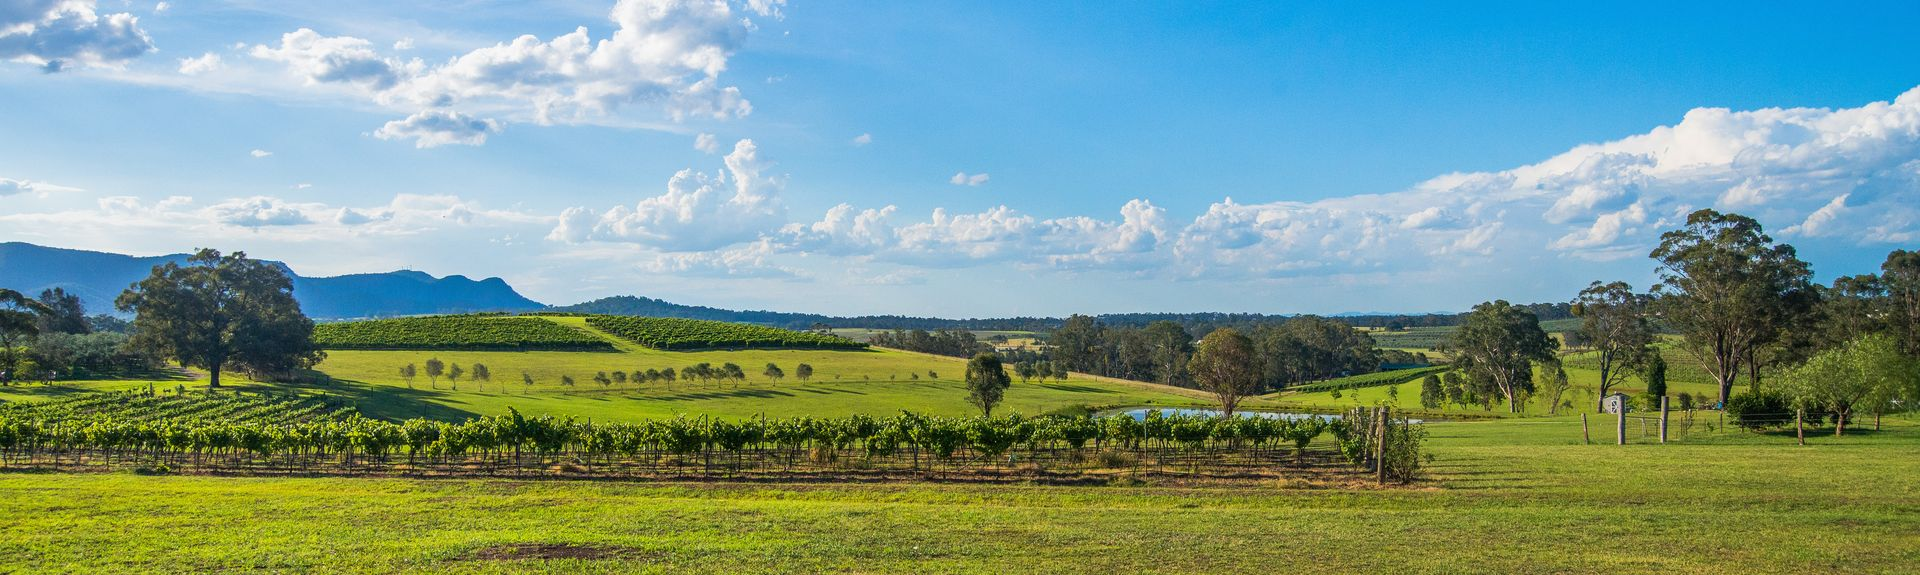 Pokolbin, Nueva Gales del Sur, Australia